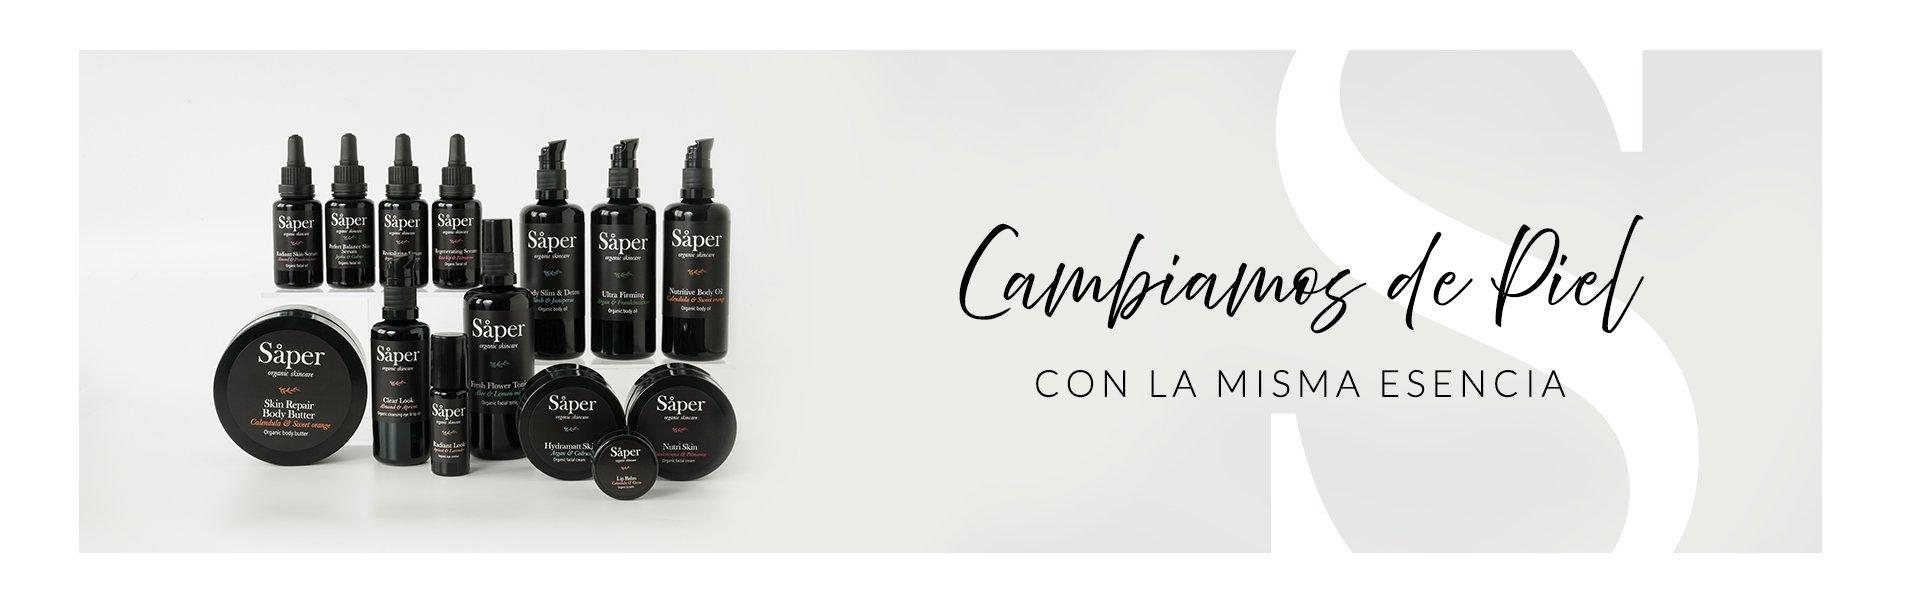 nueva-imagen-saper-cosmetica-ecologica